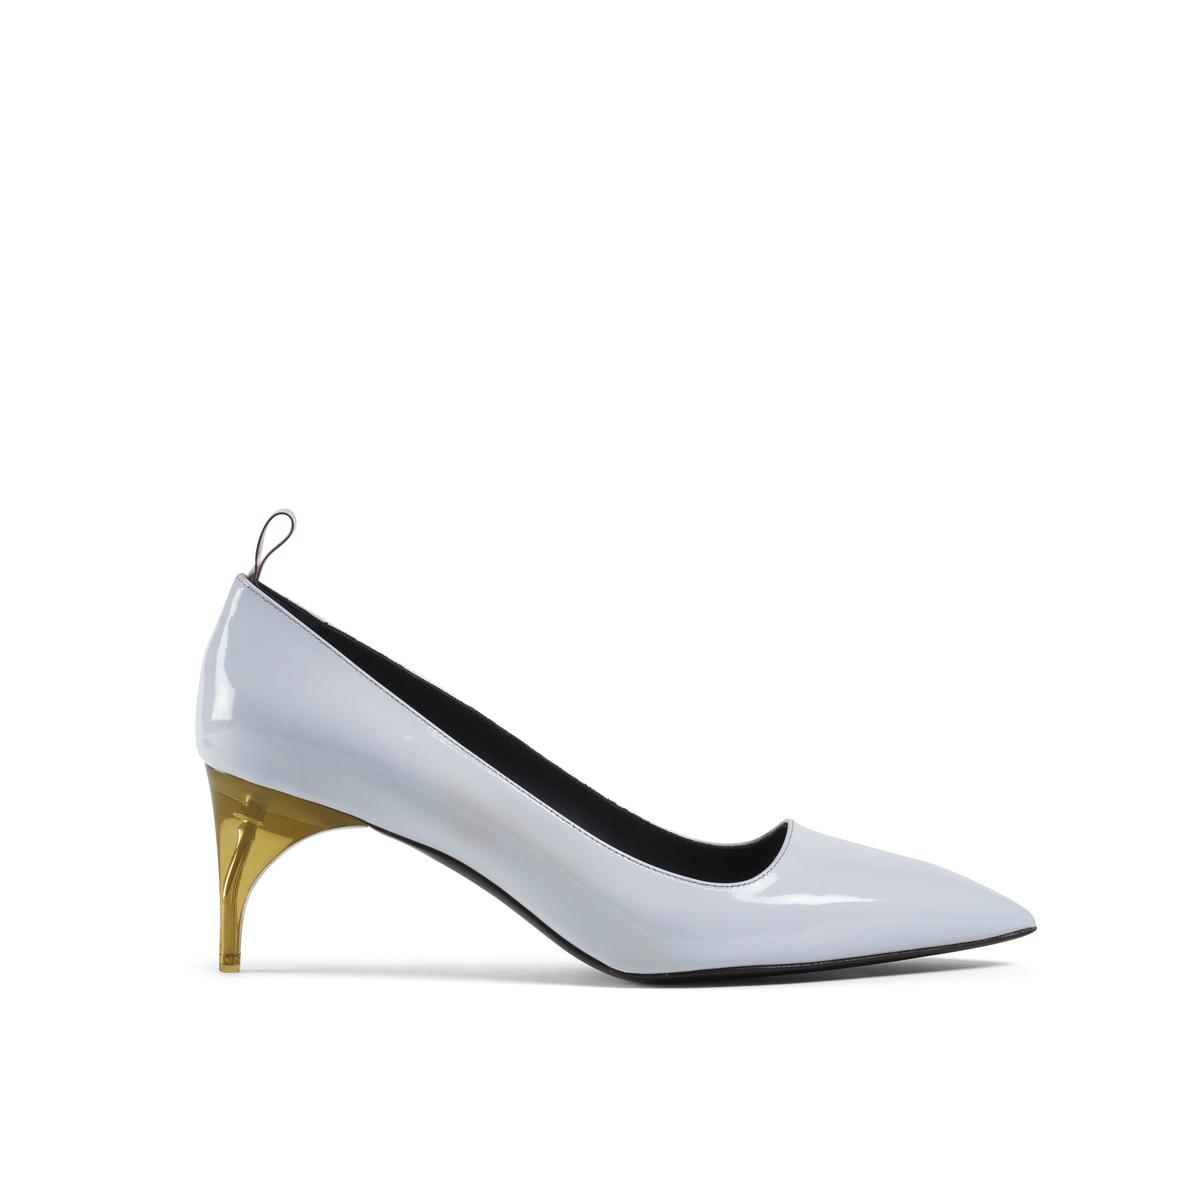 005_alaintondowski_springsummer2017_shoes_3040-091